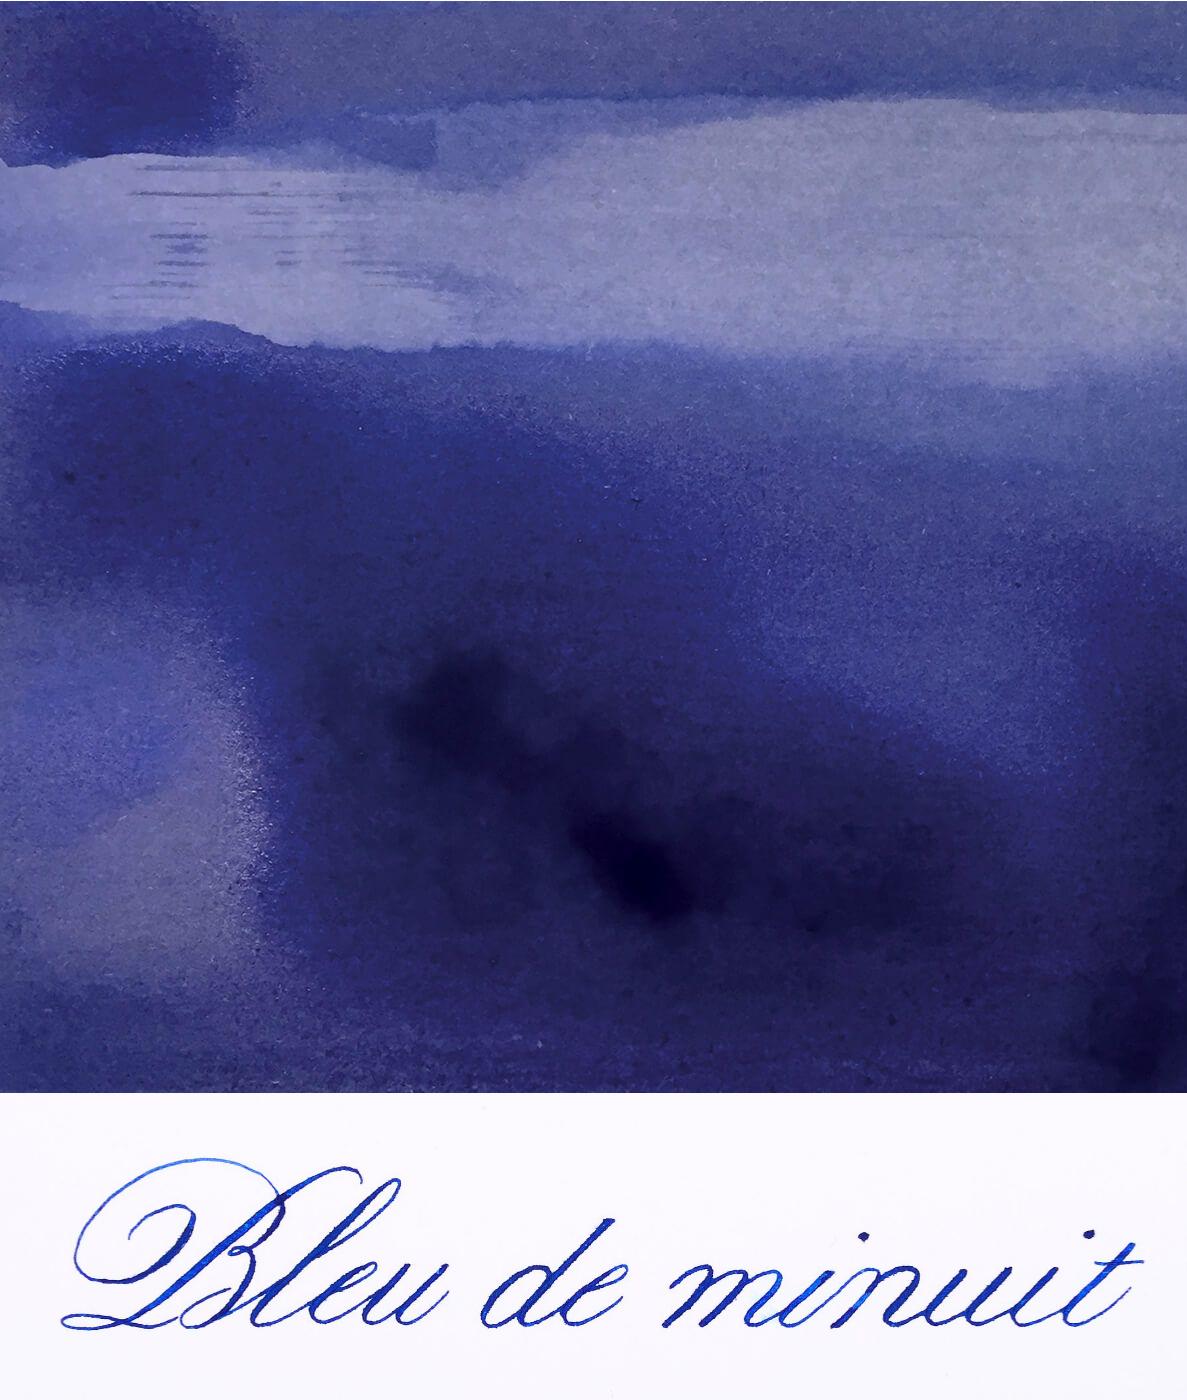 Jacques Herbin  - Bleu de minuit  Ink Sample 2ml